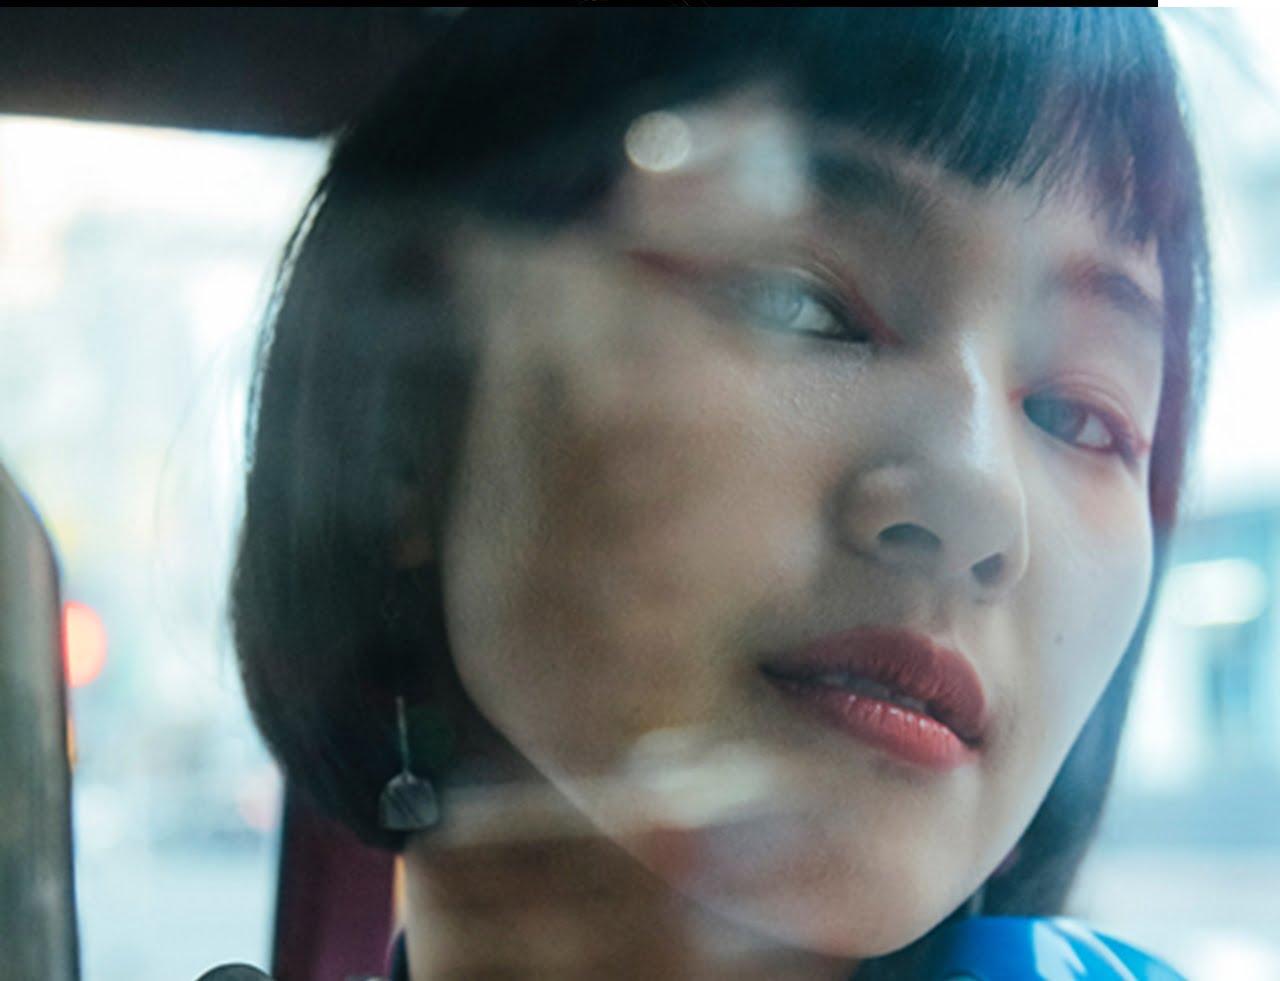 Jing vuelve a 6dimensions con 'Psychiatric Population'